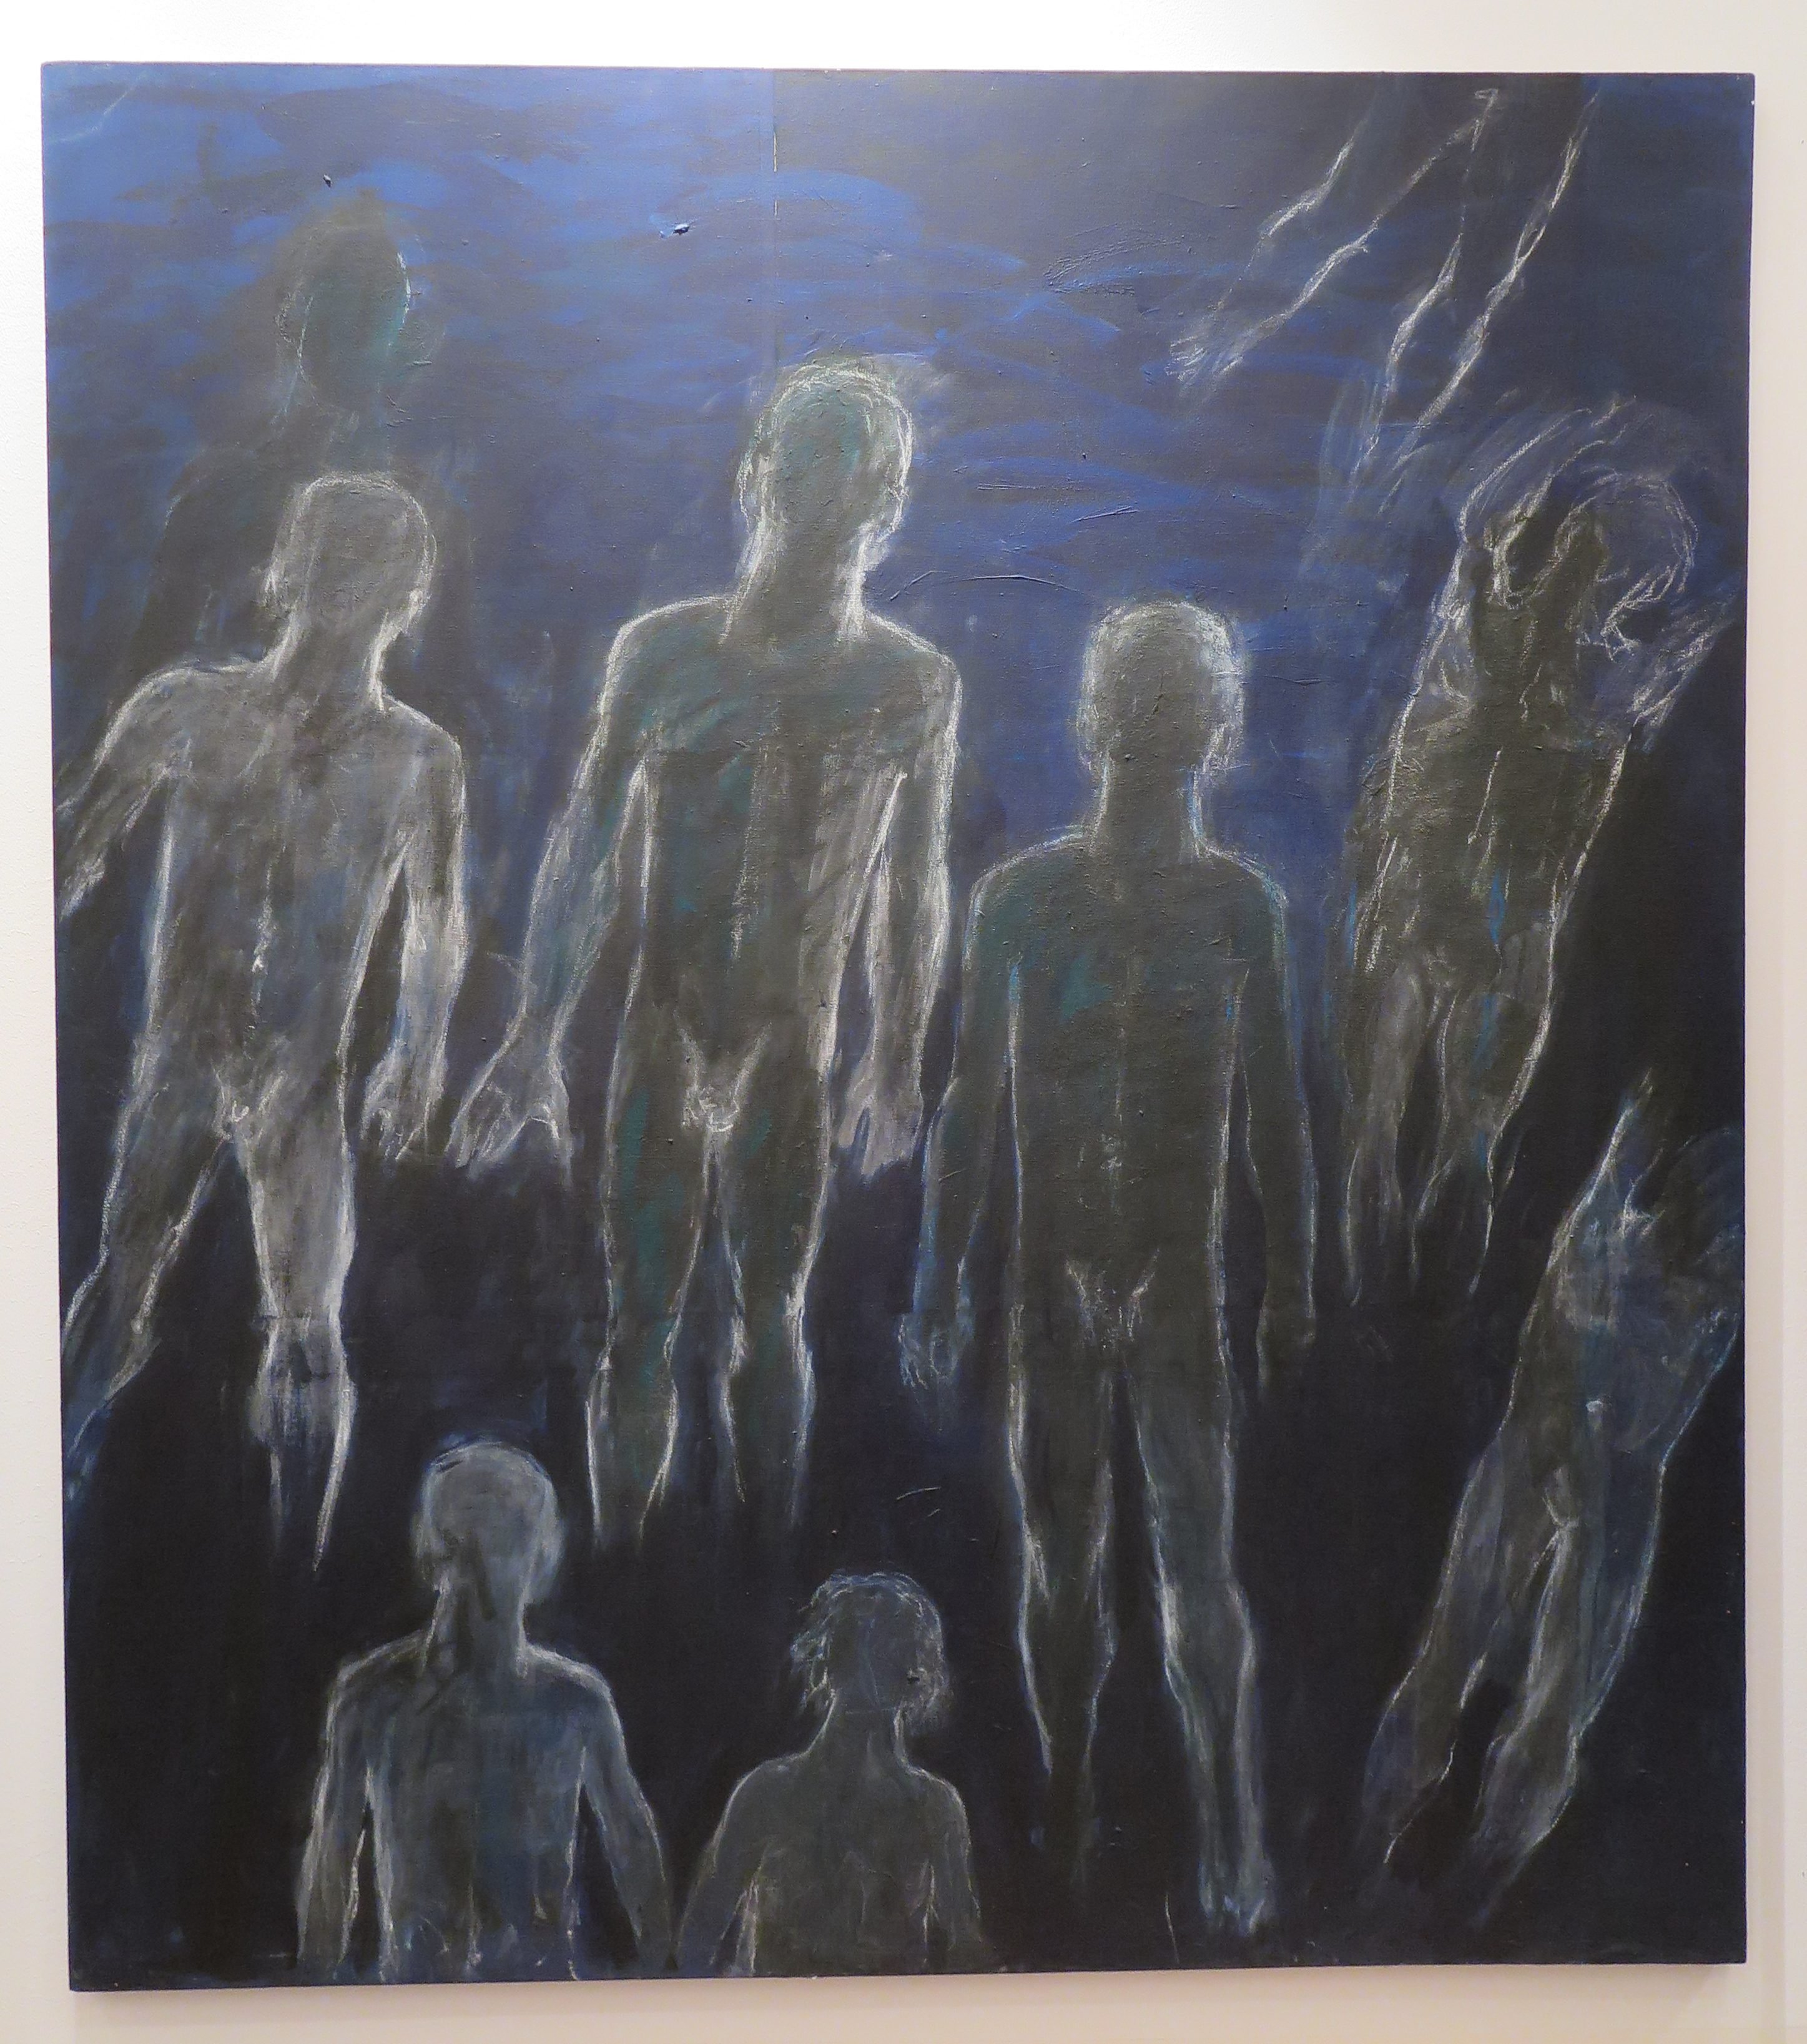 Judit Reigl - Déroulement (phase IV - anthropomorphie) - 2008